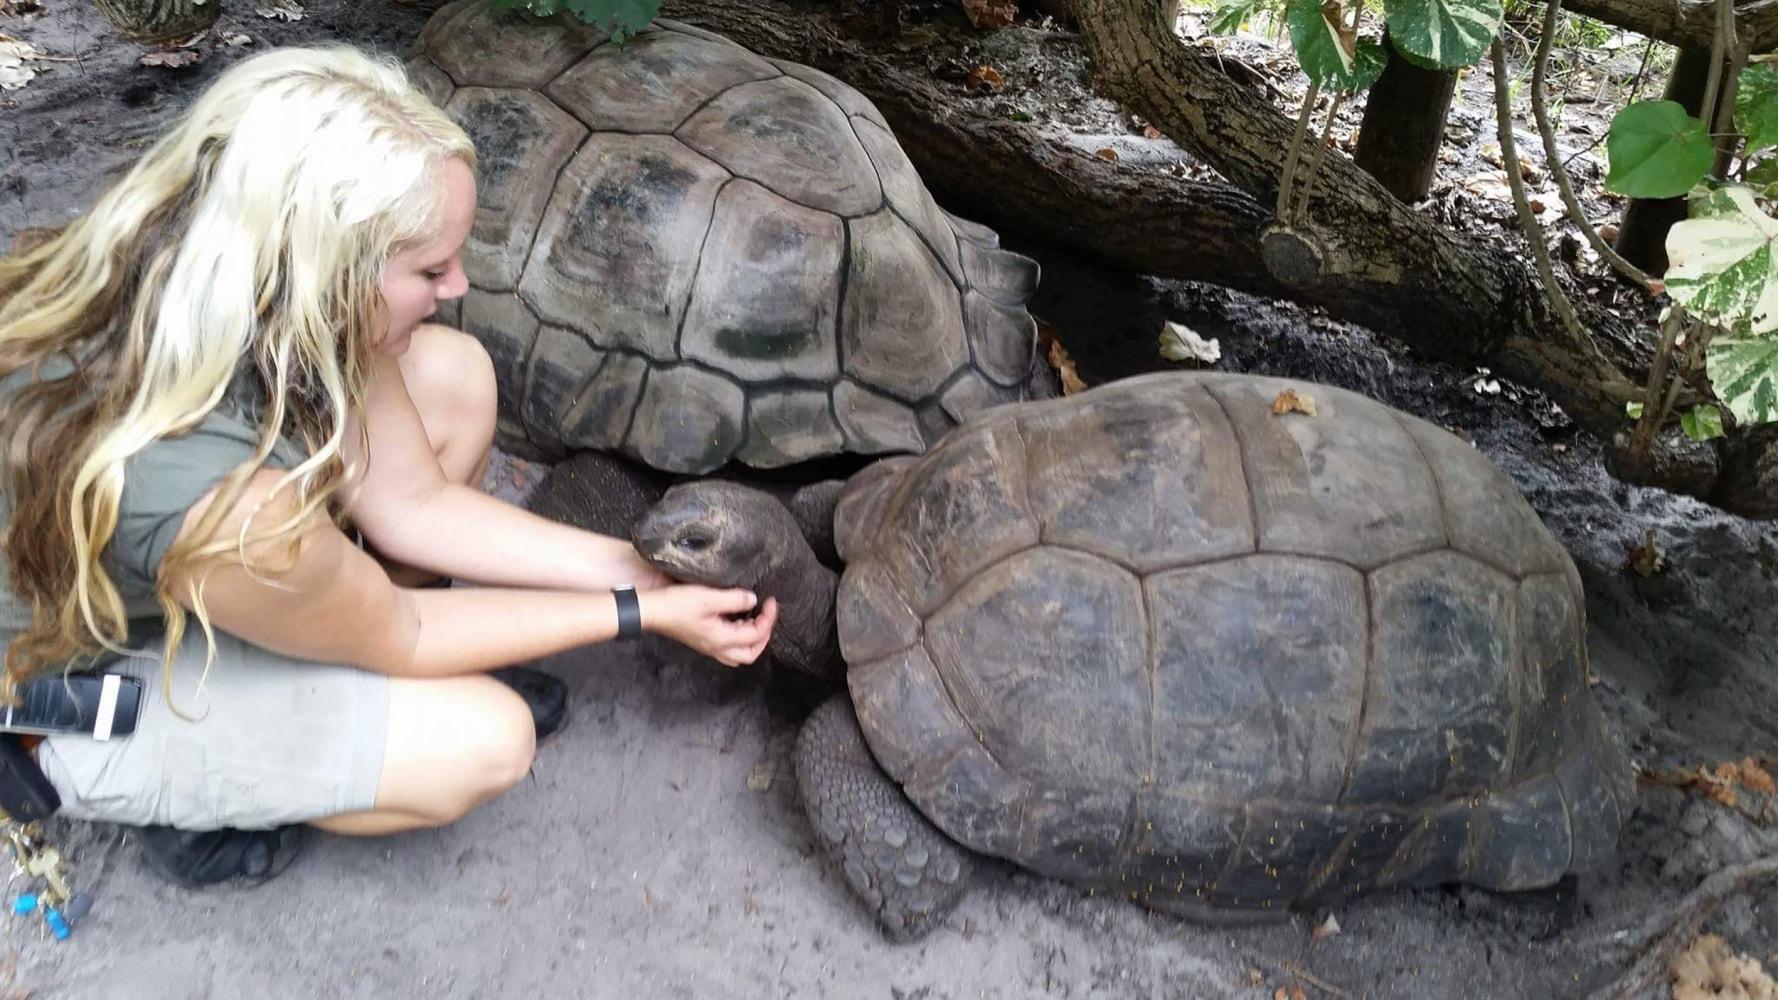 Warning turtles amp tortoises inc - Image Palm Beach Zoo Aldabra Tortoises